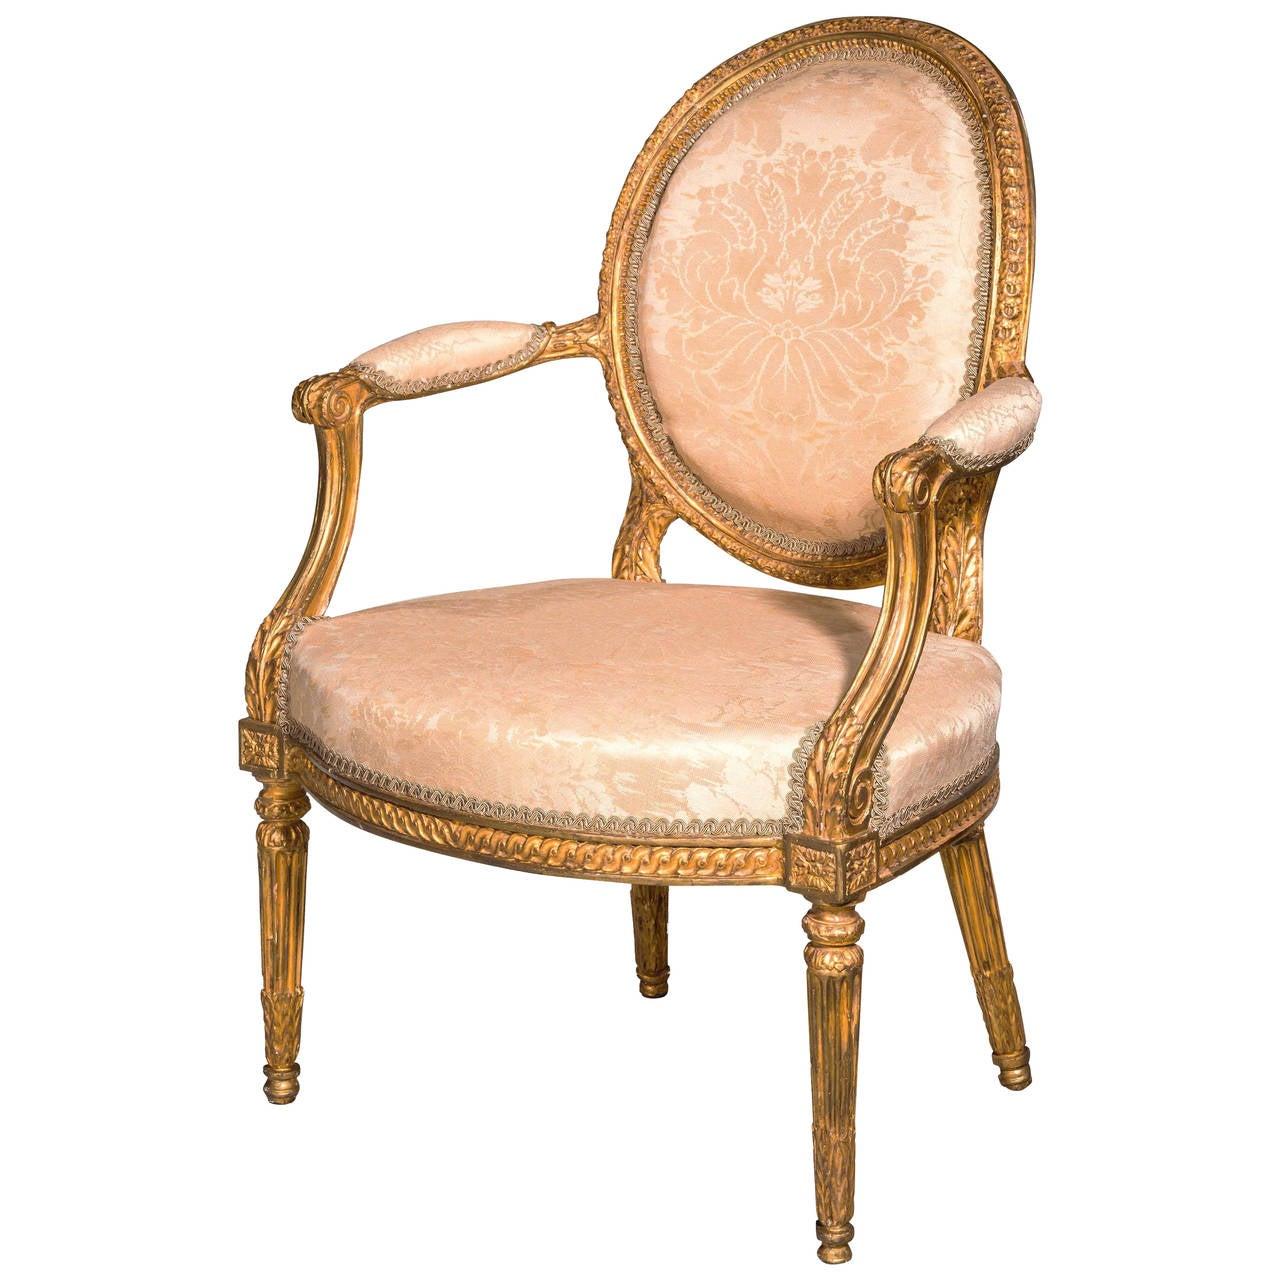 Late 18th Century Giltwood Armchair